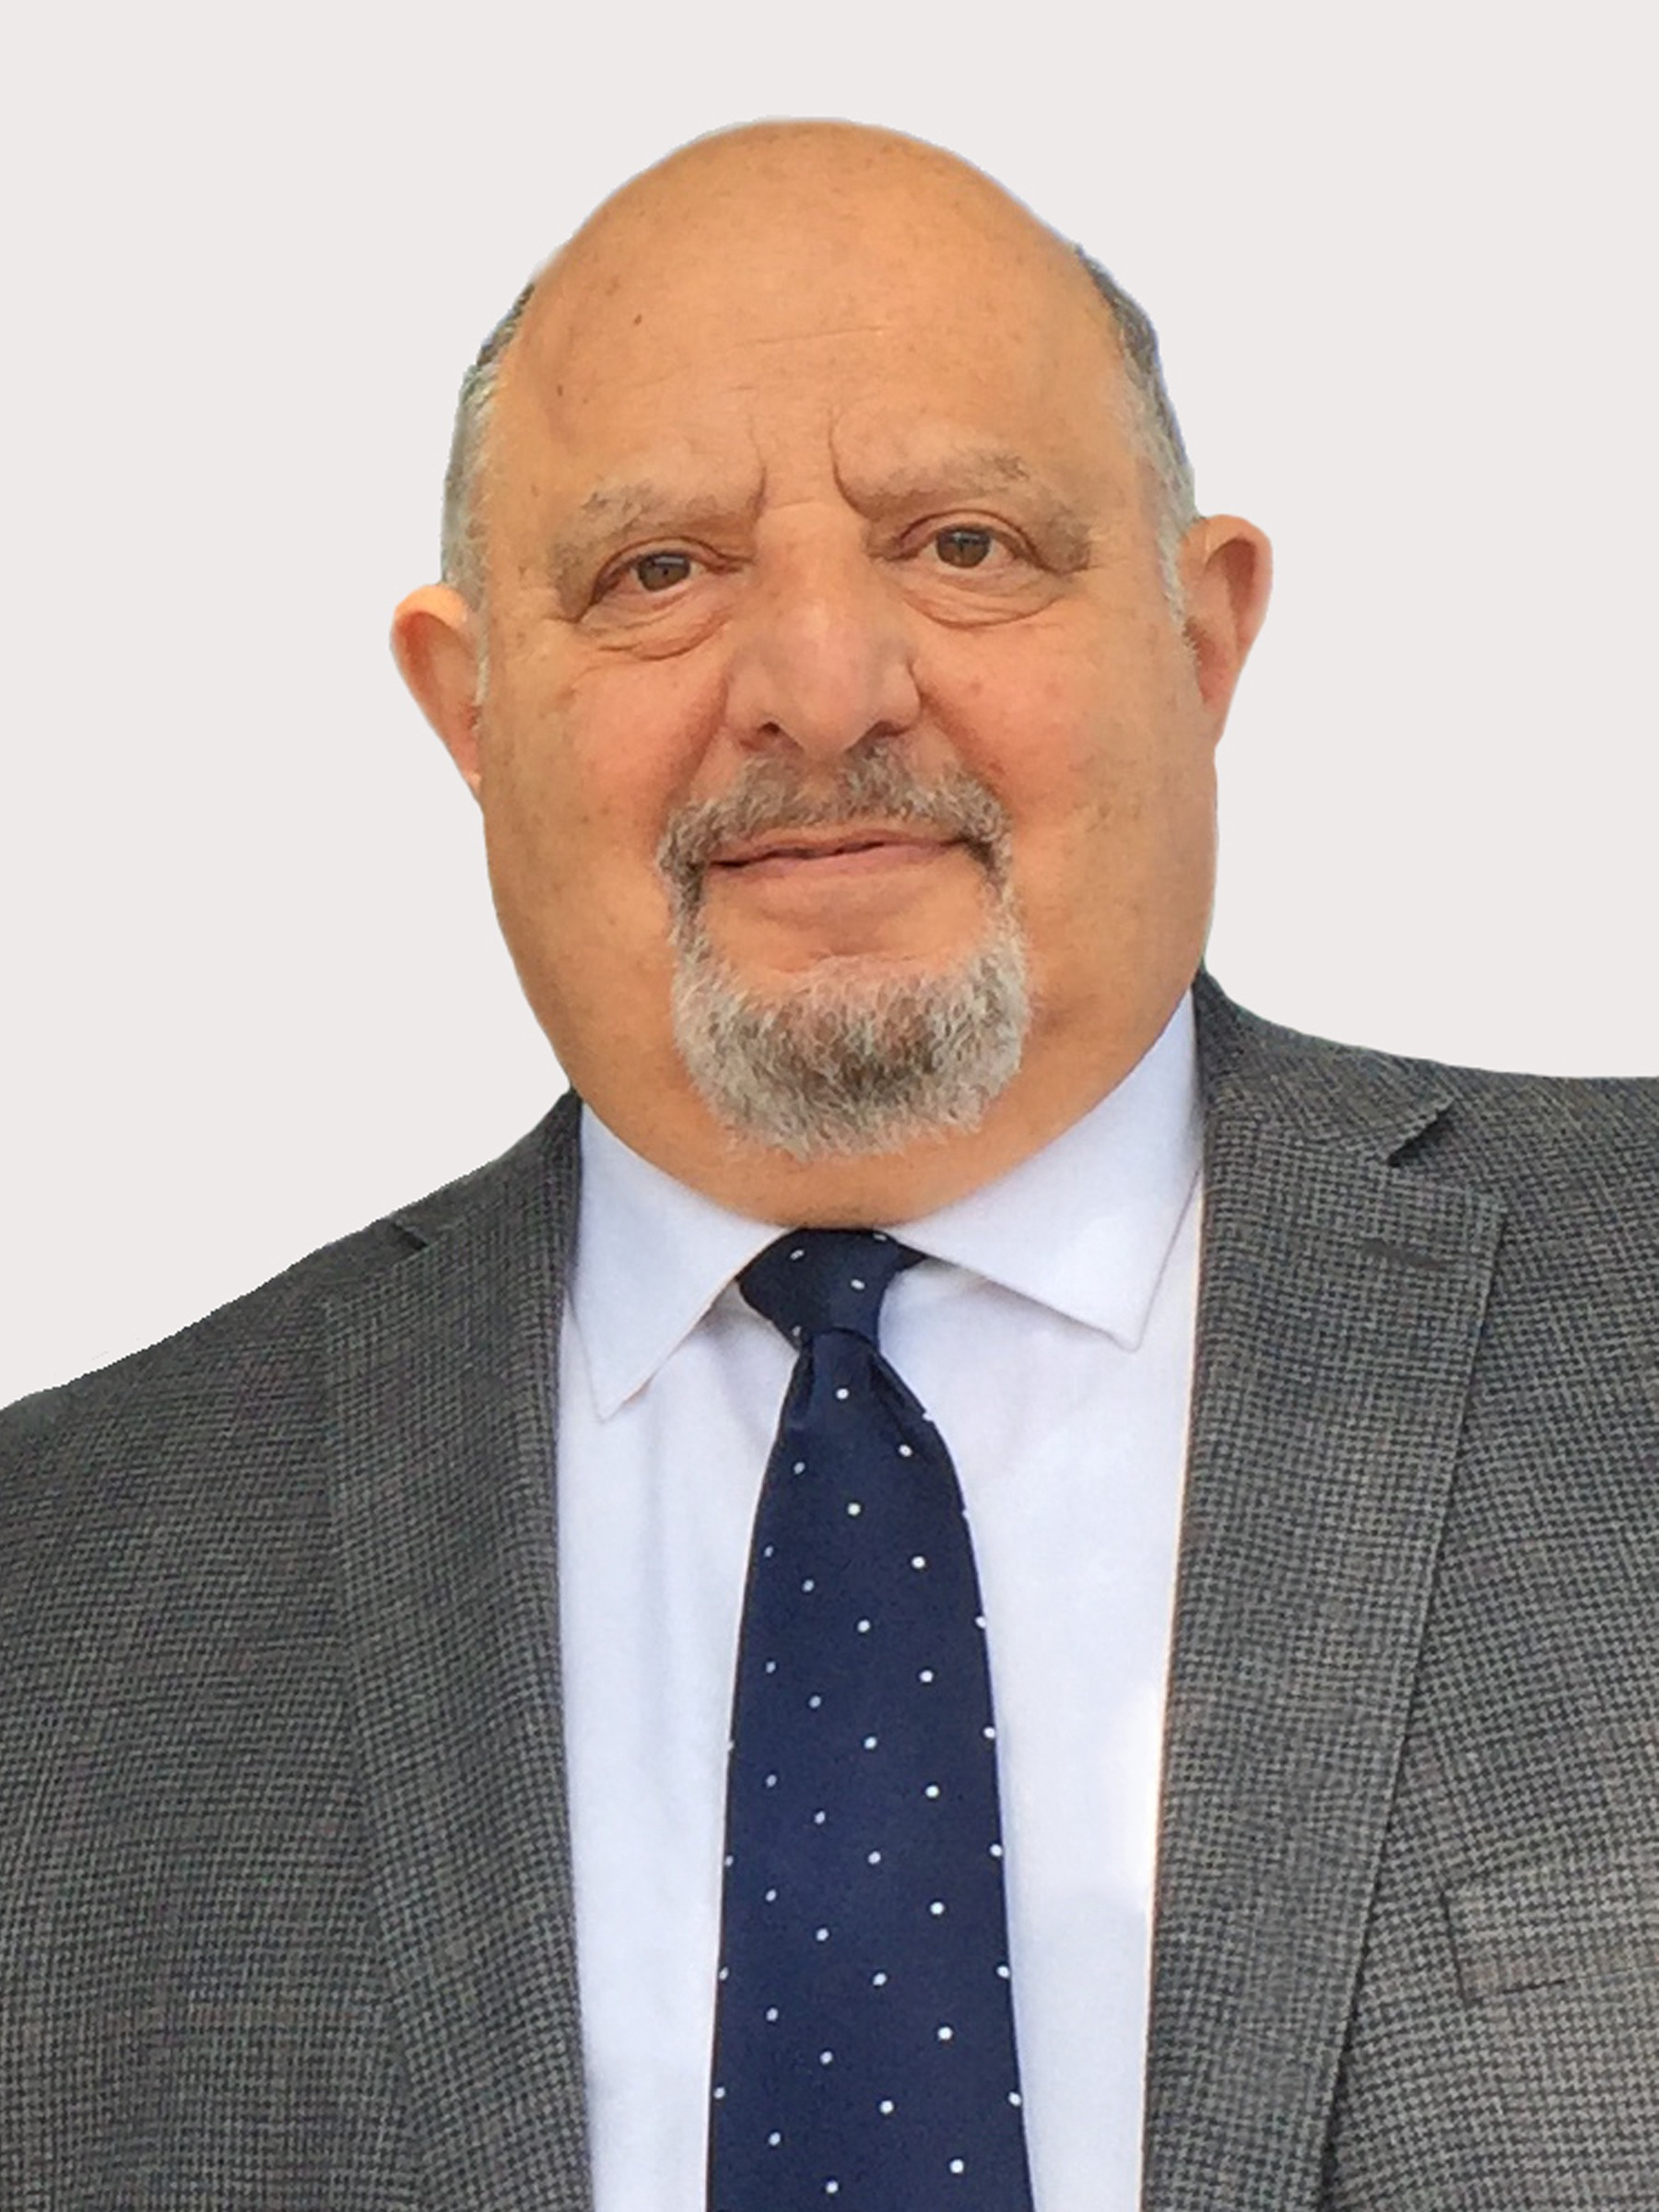 Nicholas Koopalethes